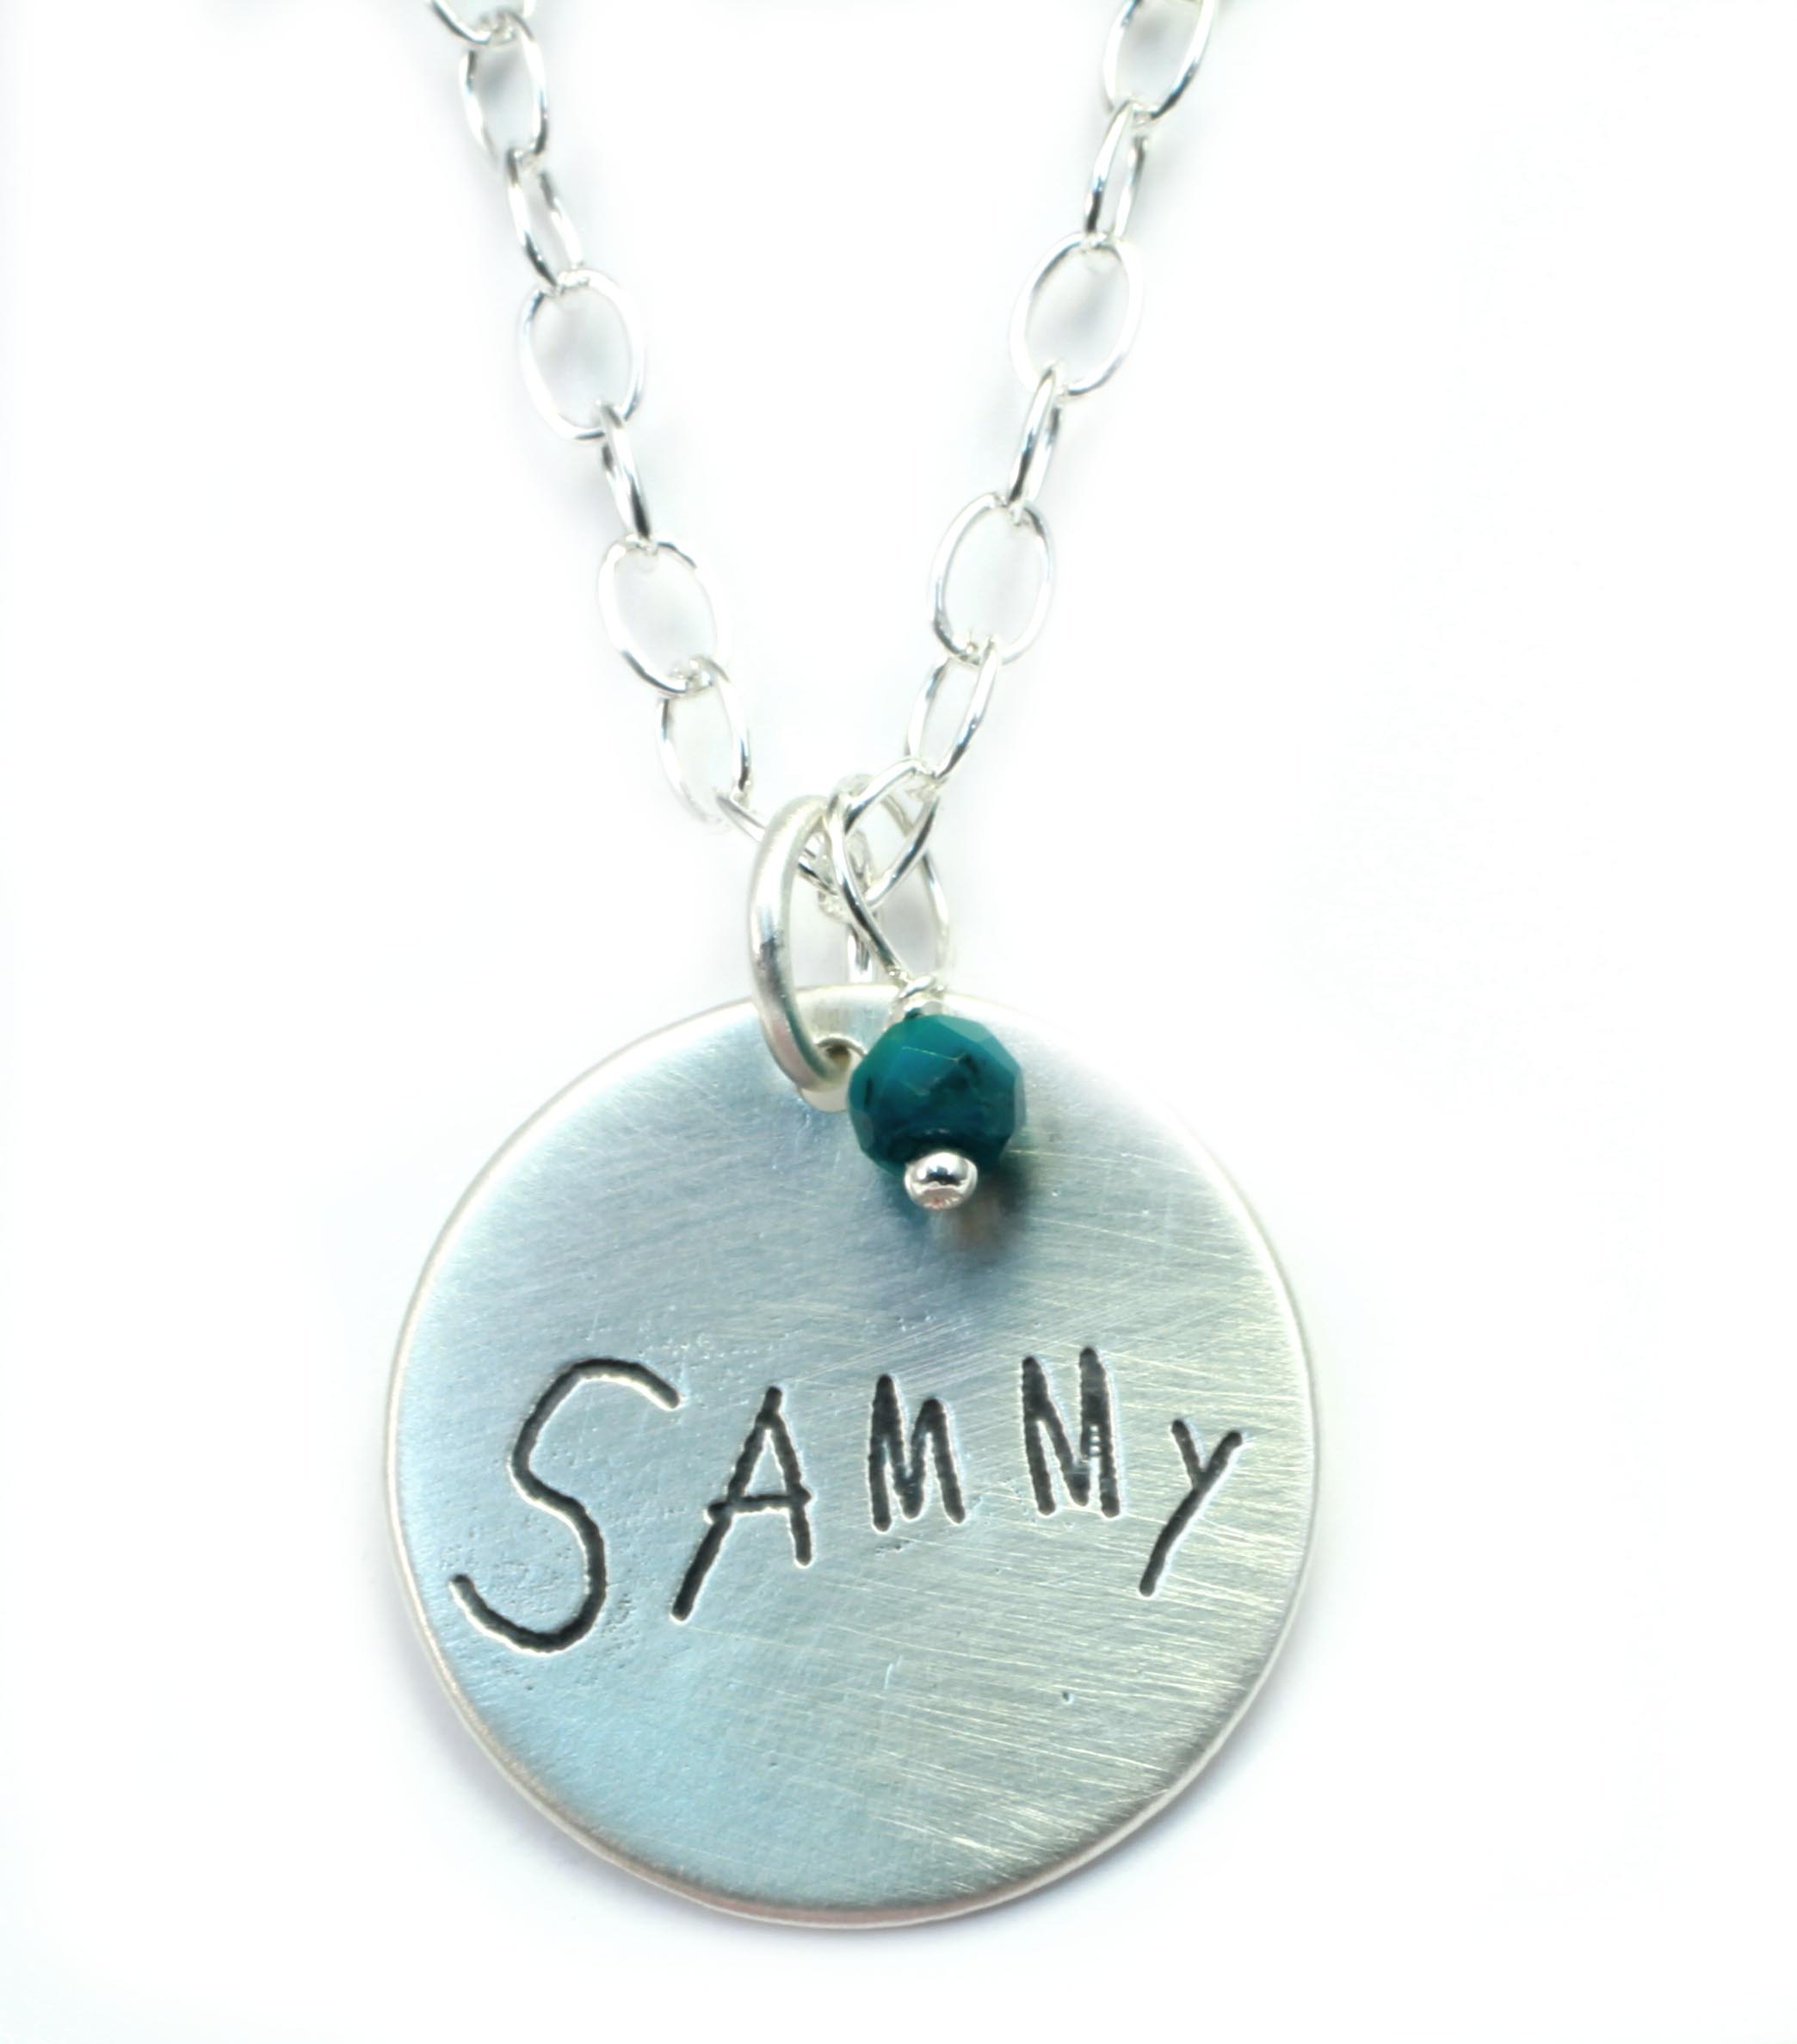 Sammy: Handwriting Charm